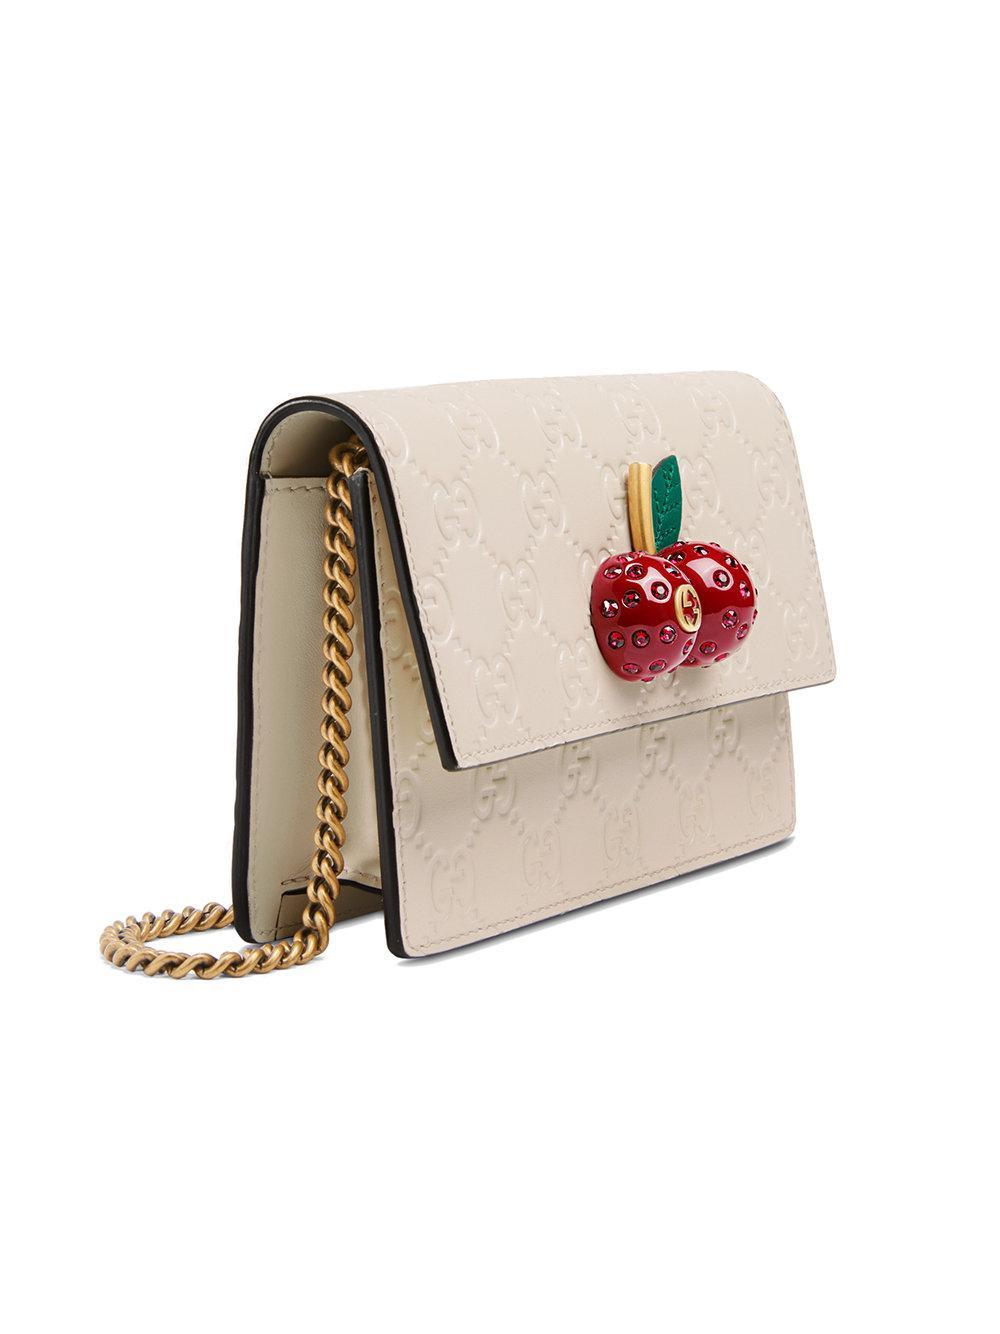 e17022e4a Gucci - White Signature Mini Bag With Cherries - Lyst. View fullscreen